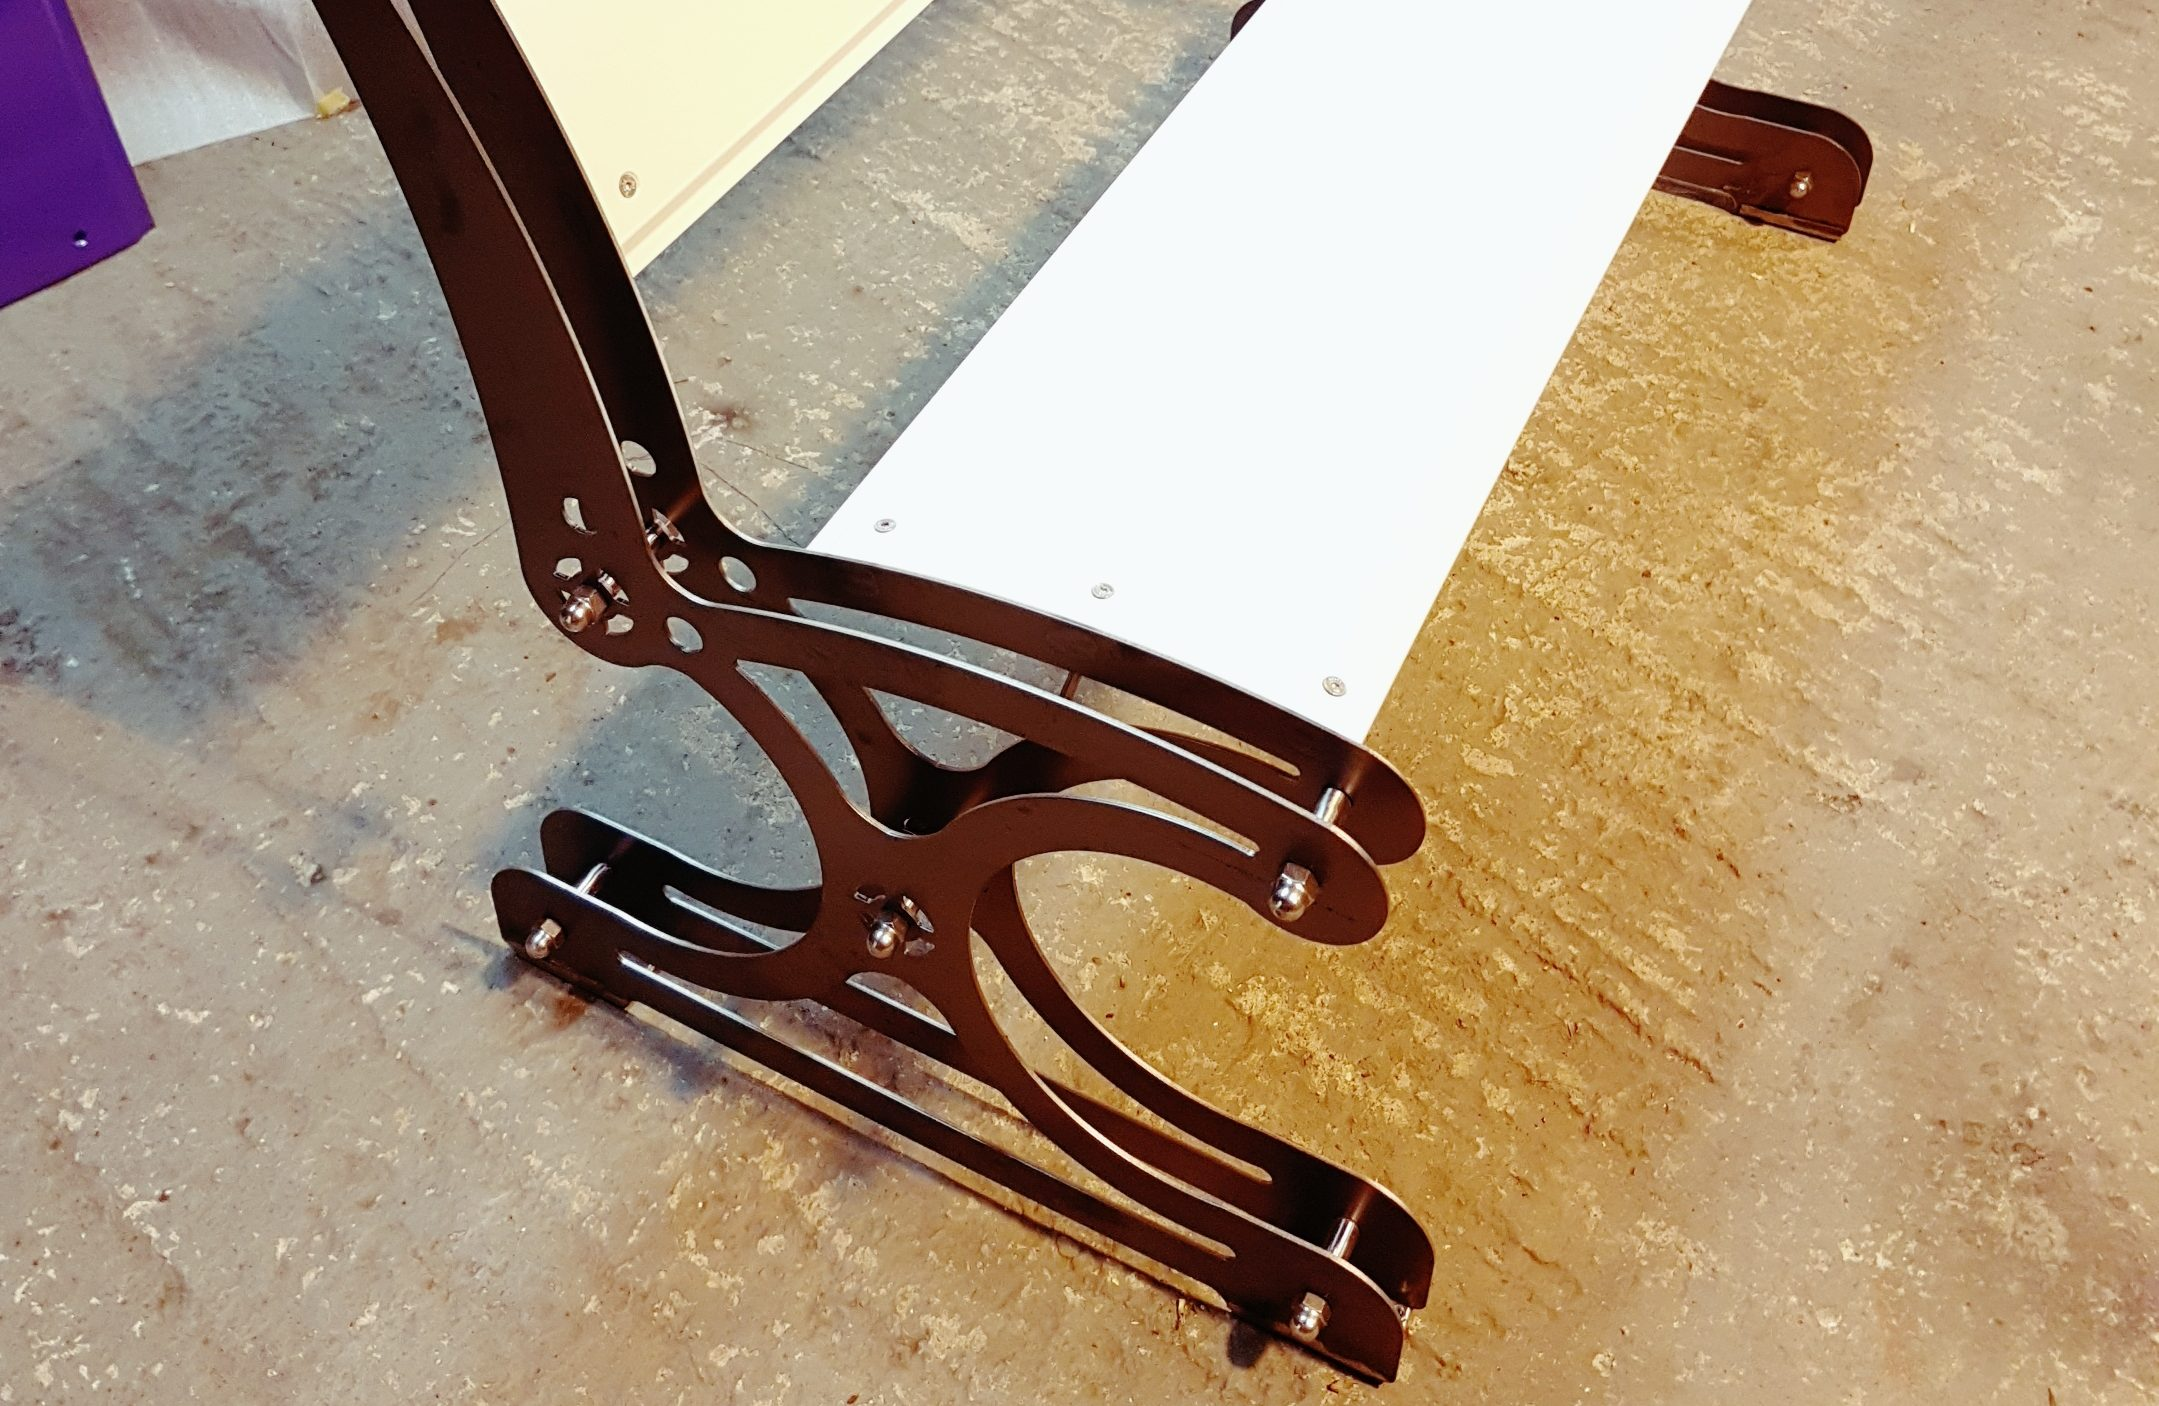 Aero Bench, extruded aluminum bench seating, exclusive garden furniture.